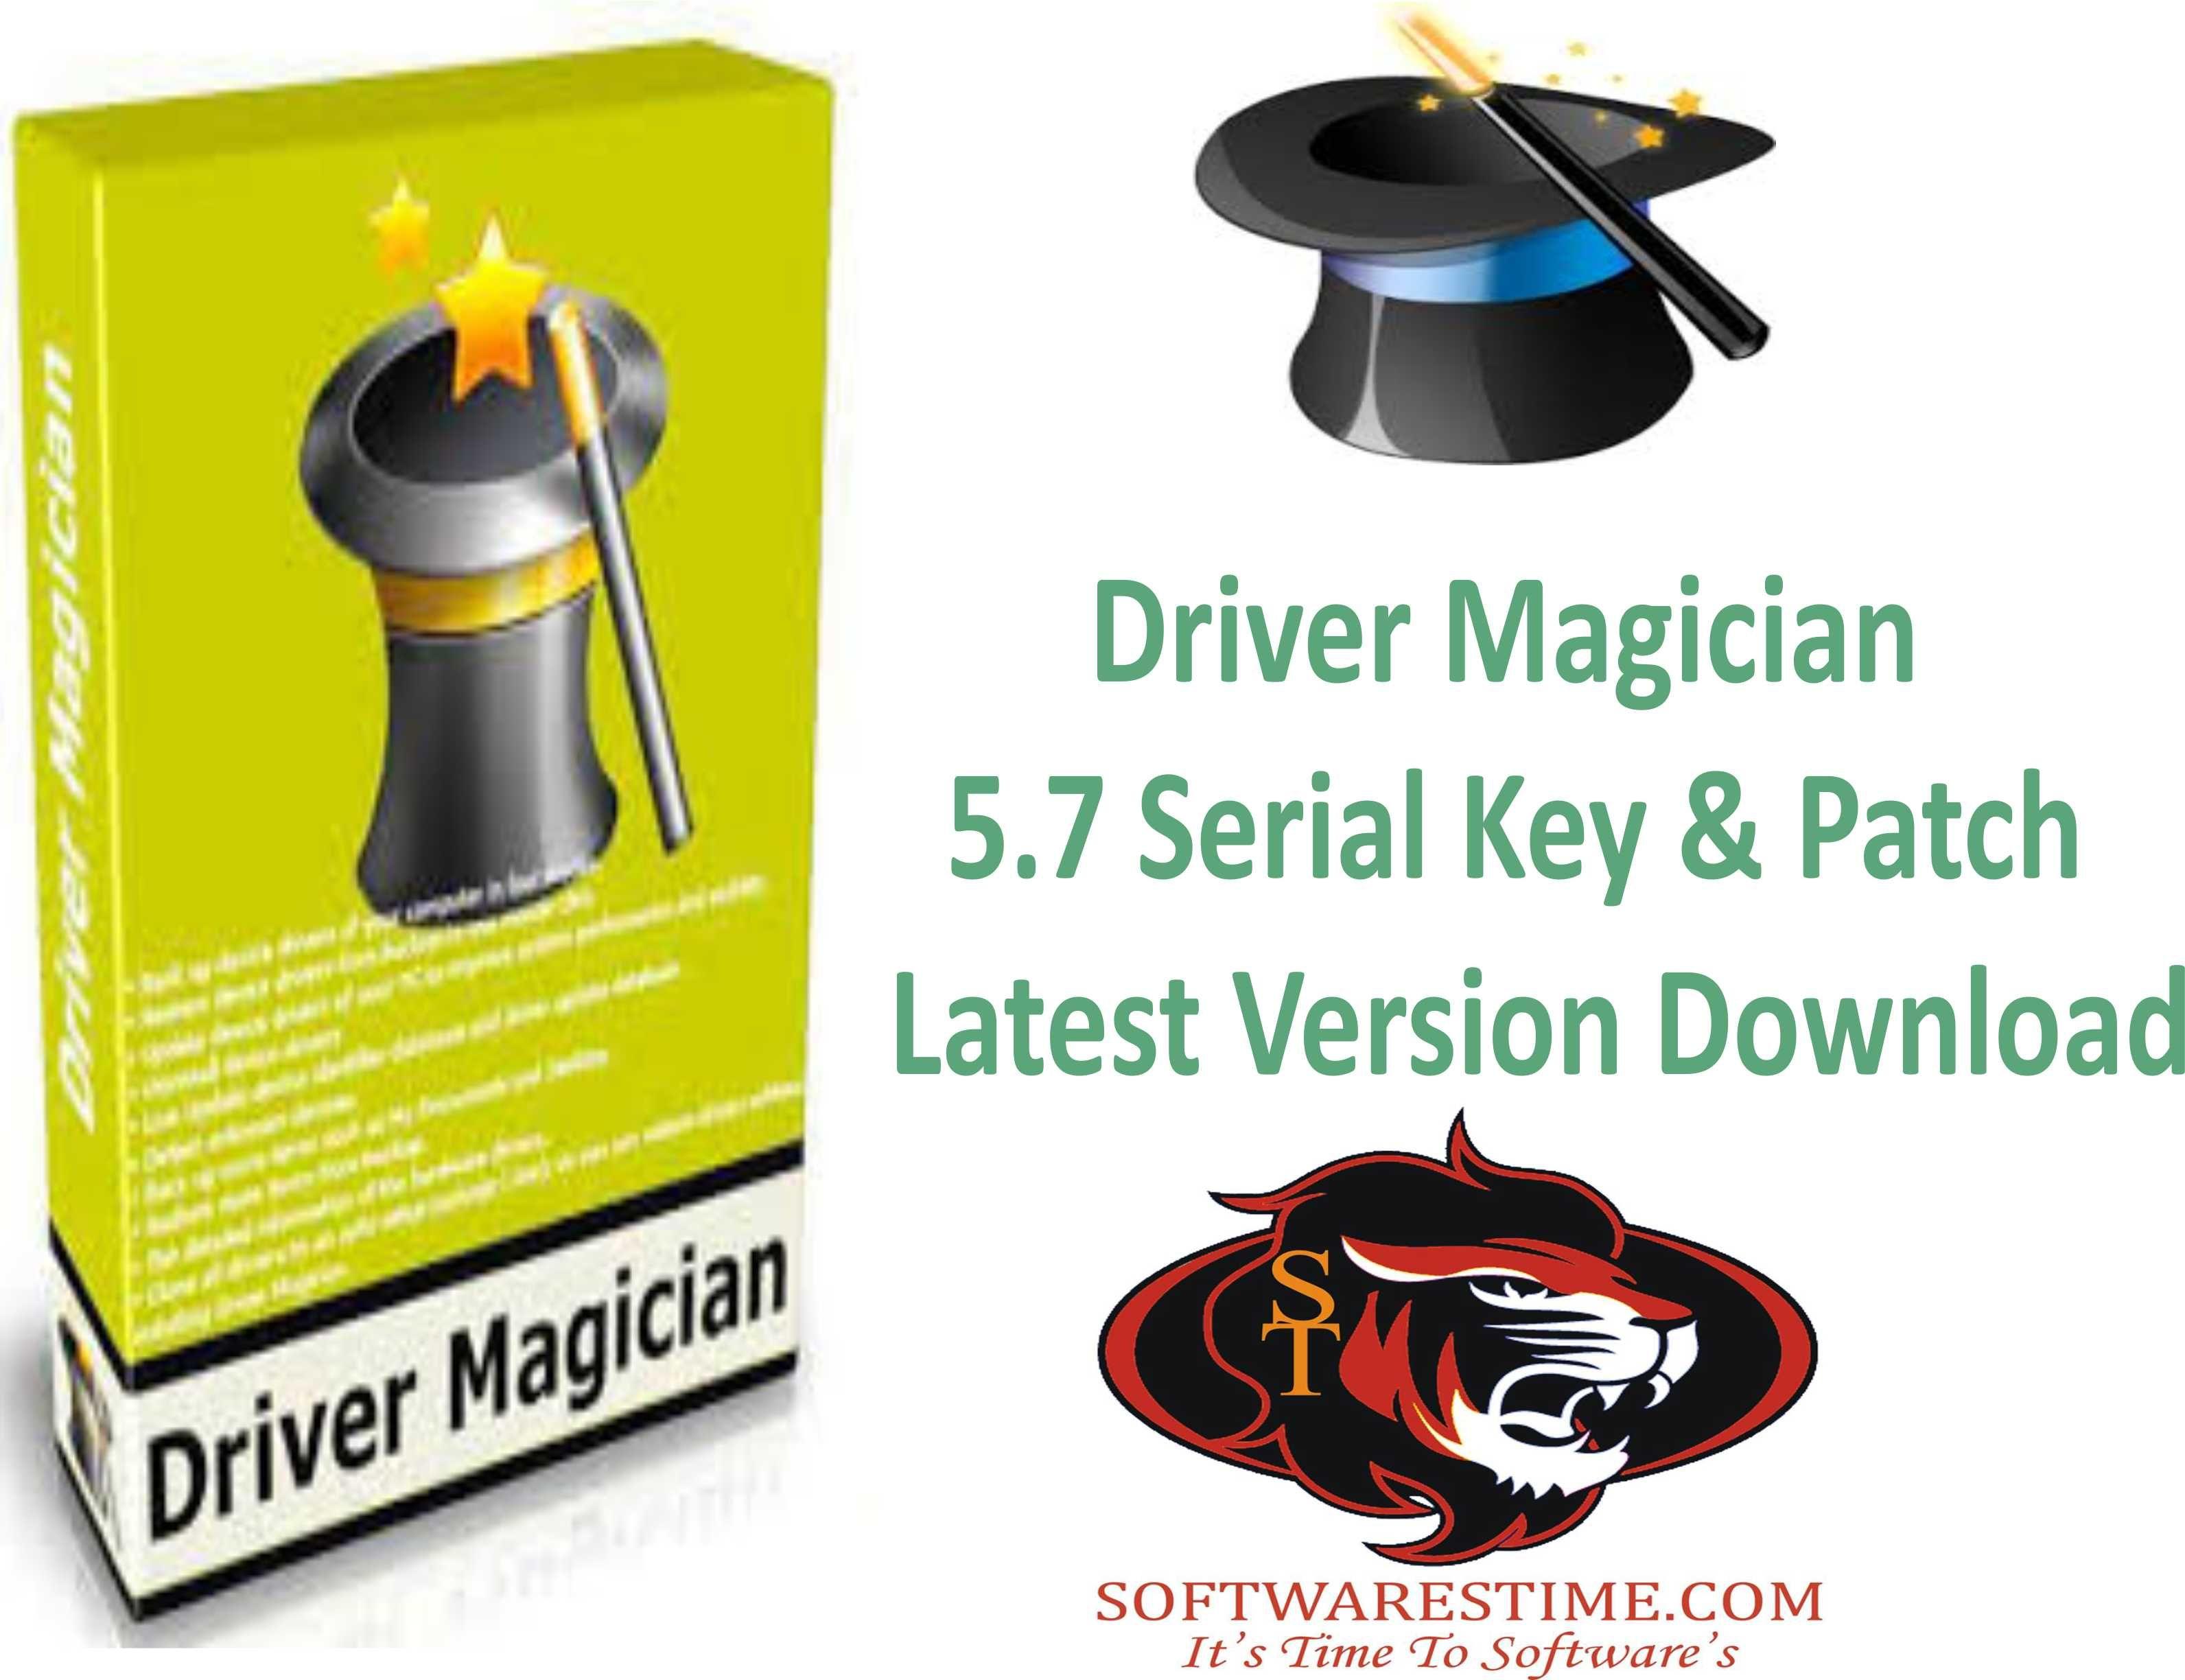 download driver magician + serial key